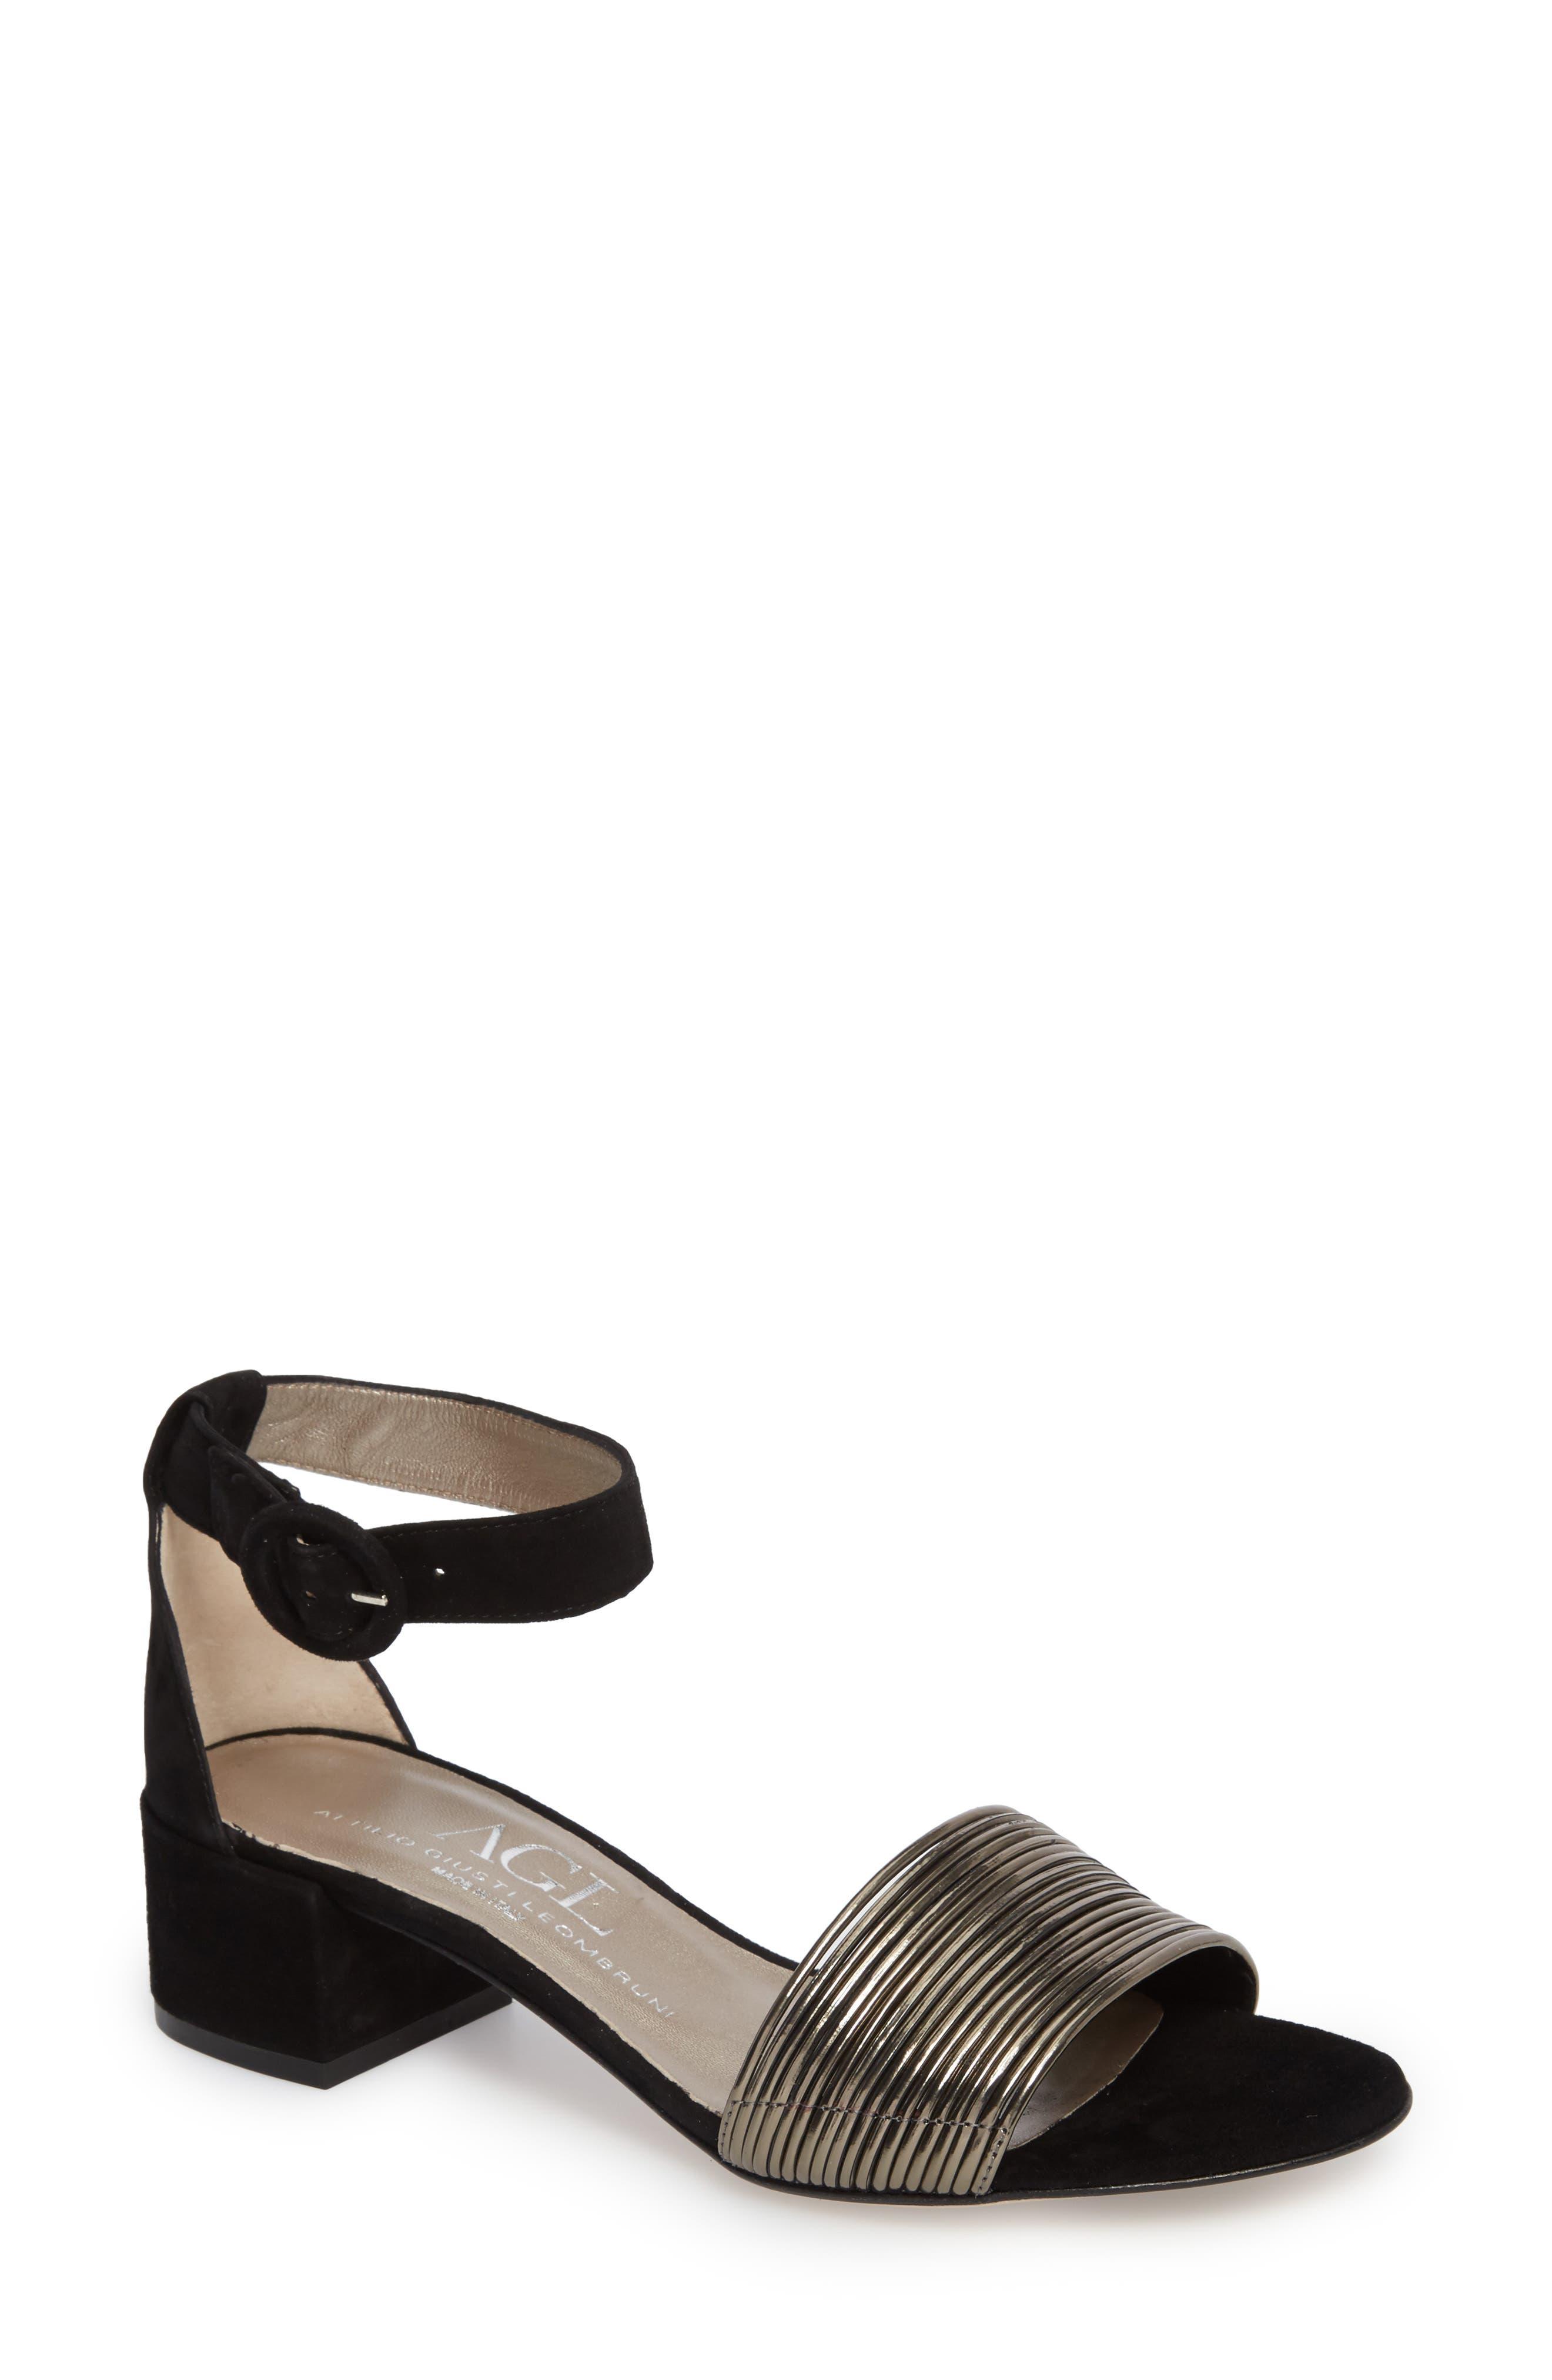 Alternate Image 1 Selected - AGL Ankle Strap Sandal (Women)